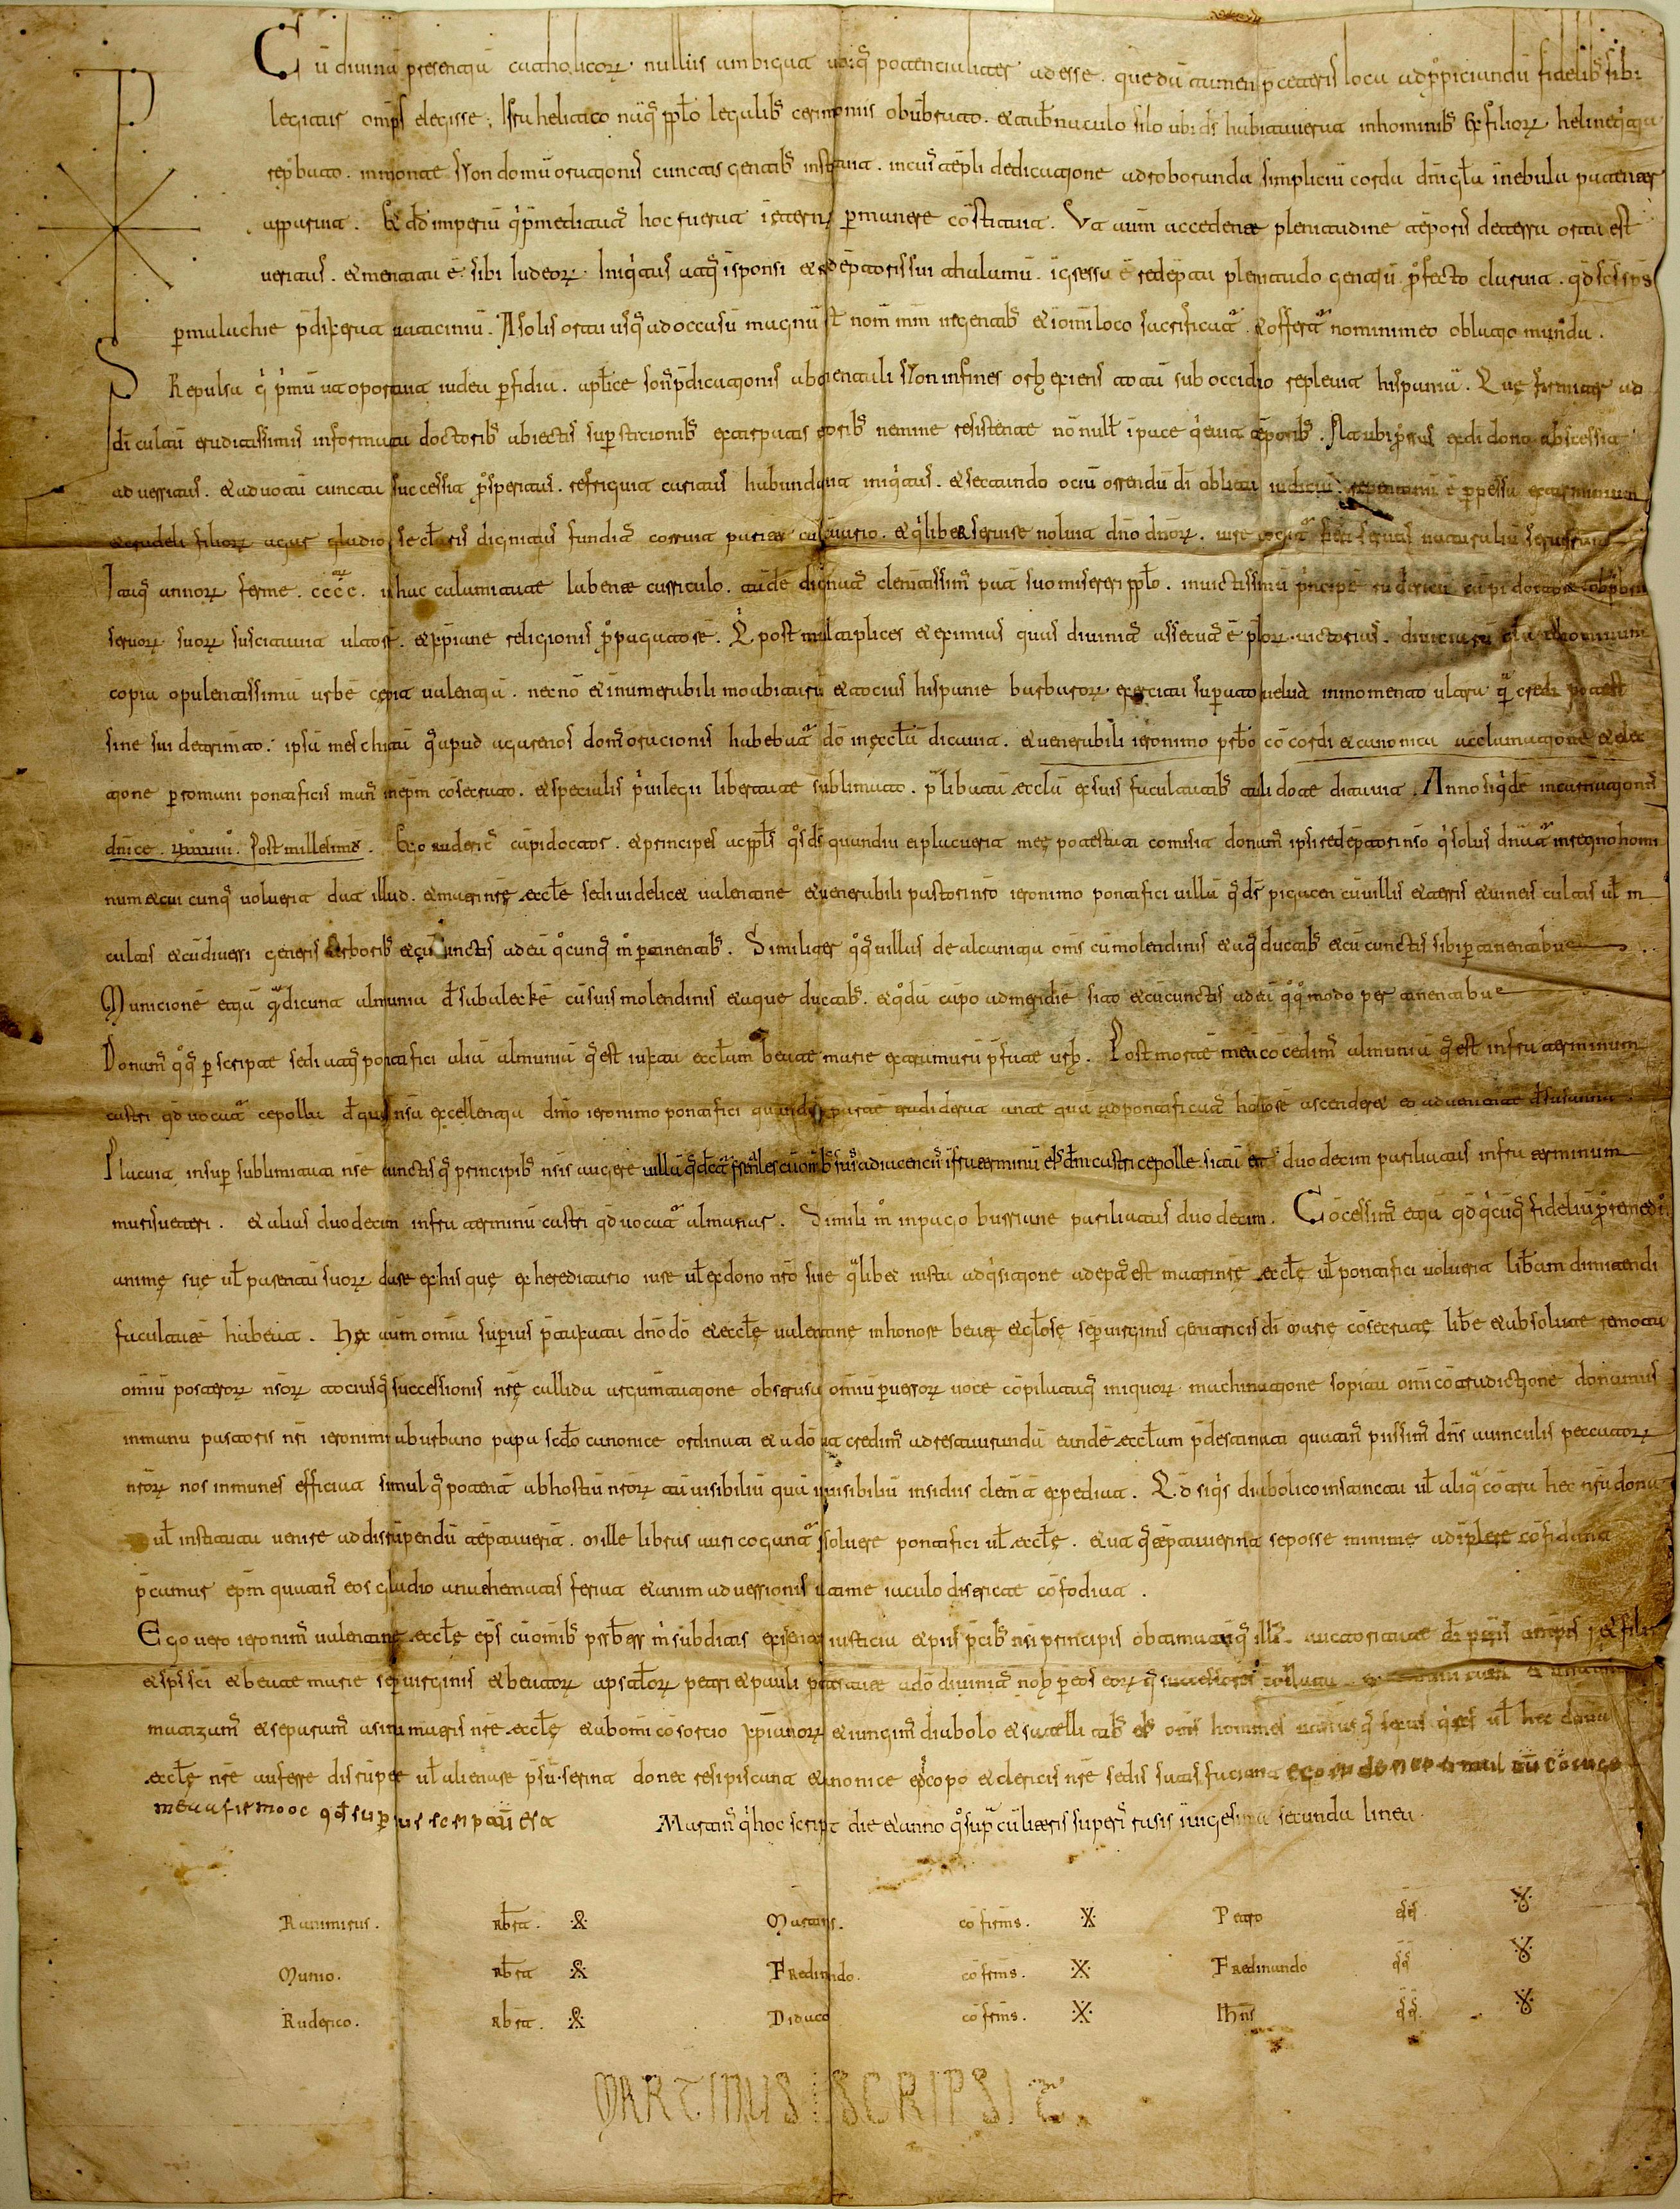 genealogia cid campeador: